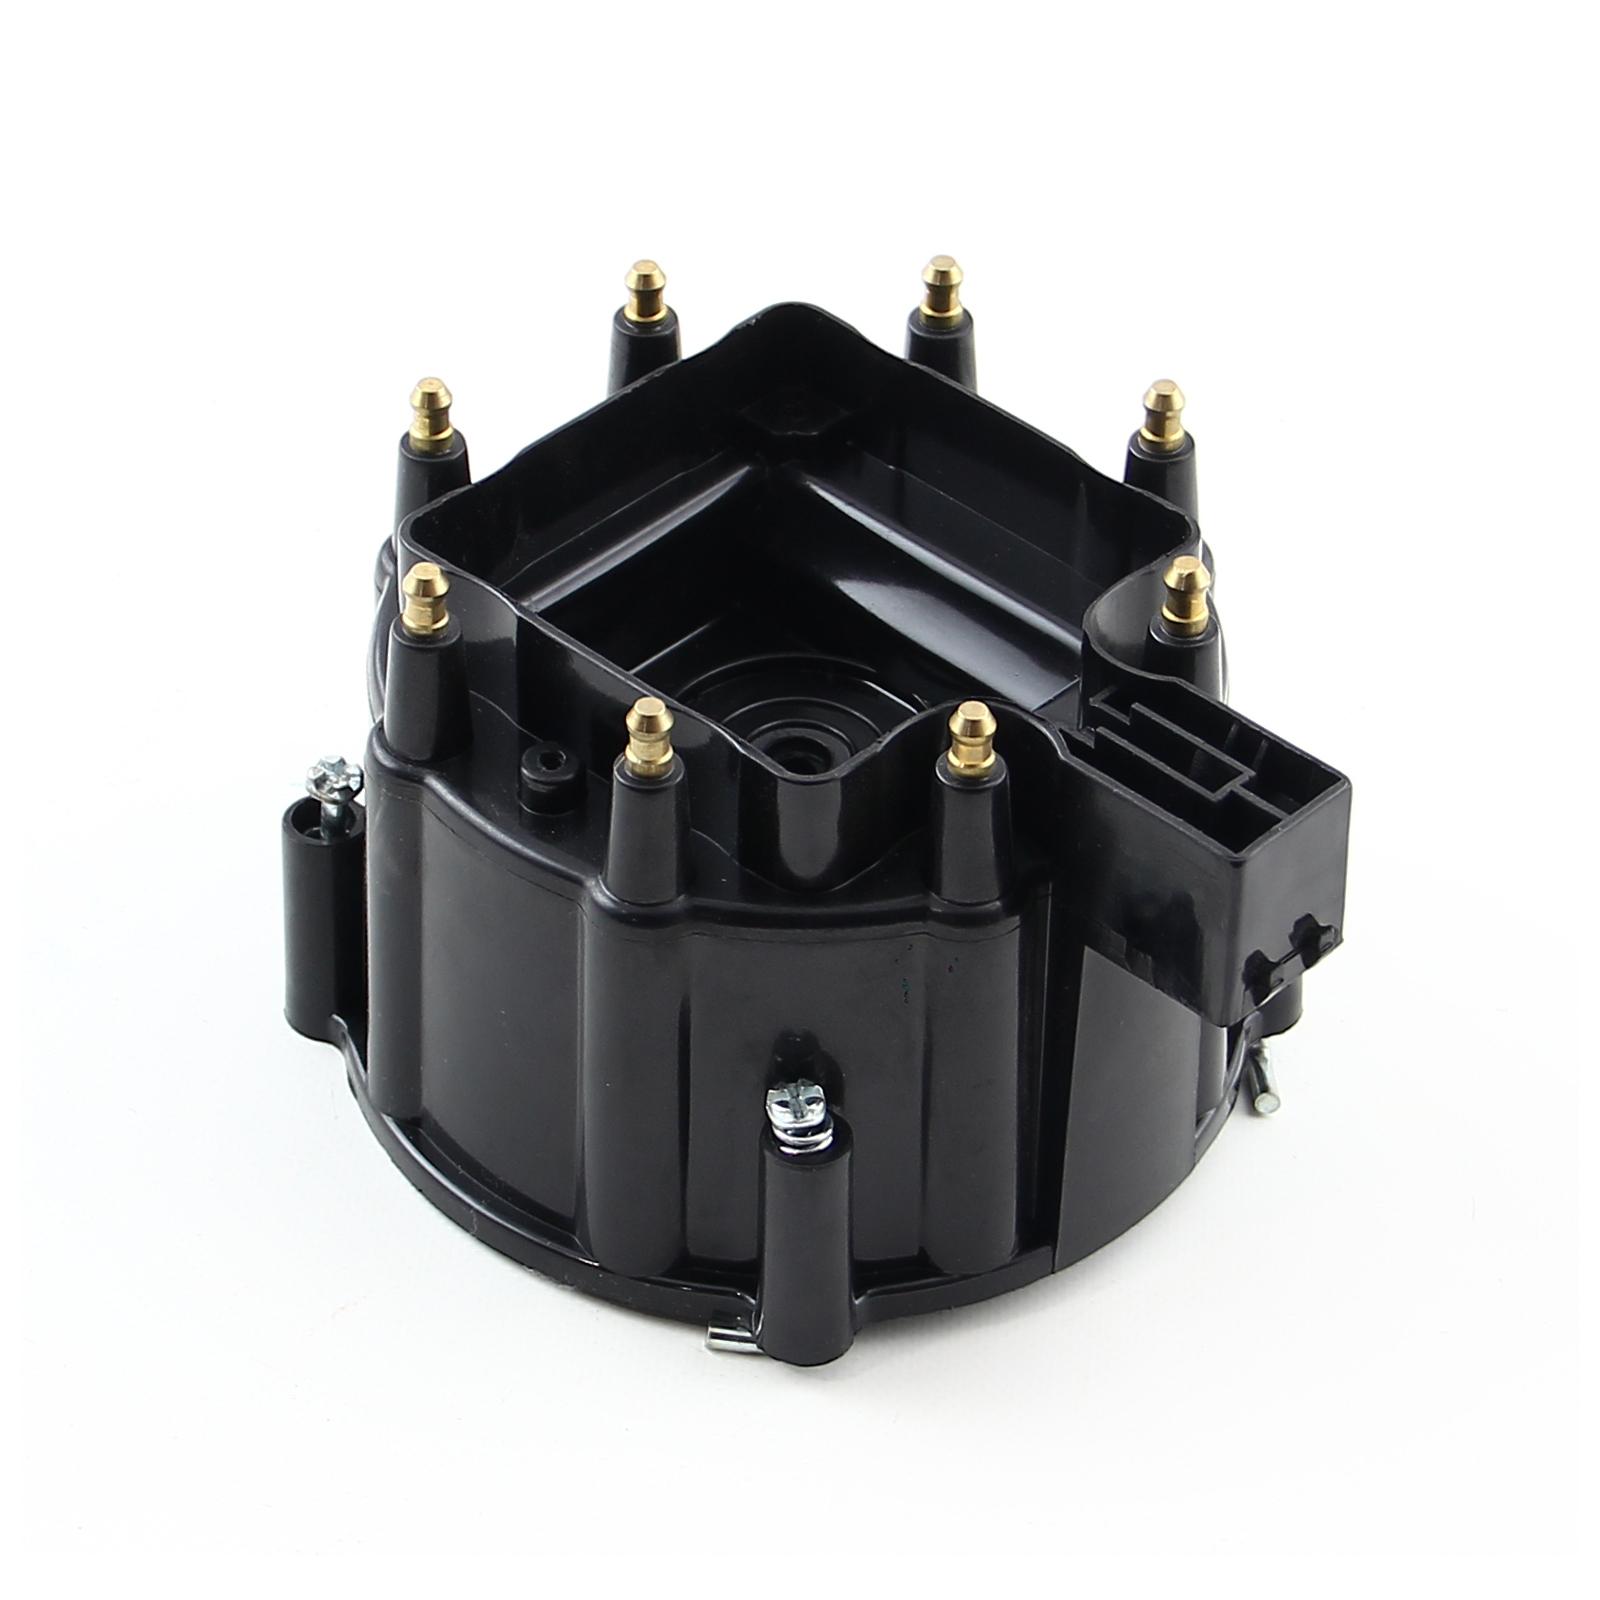 HEI Replacement Distributor Cap Brass Terminals - Black